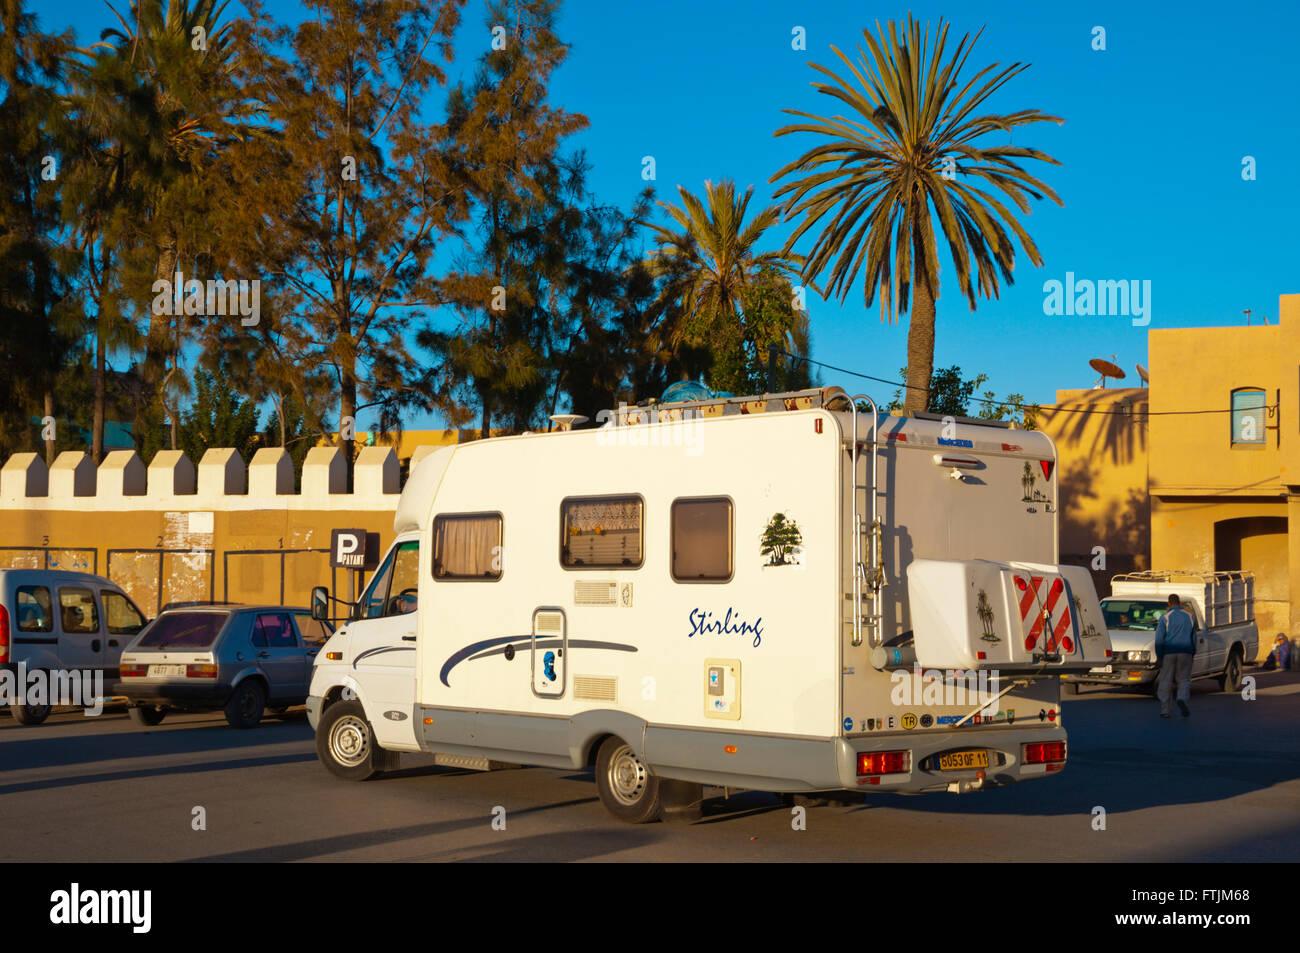 Campervan, Tiznit, Souss-Massa-Drâa, southern Morocco, northern Africa - Stock Image